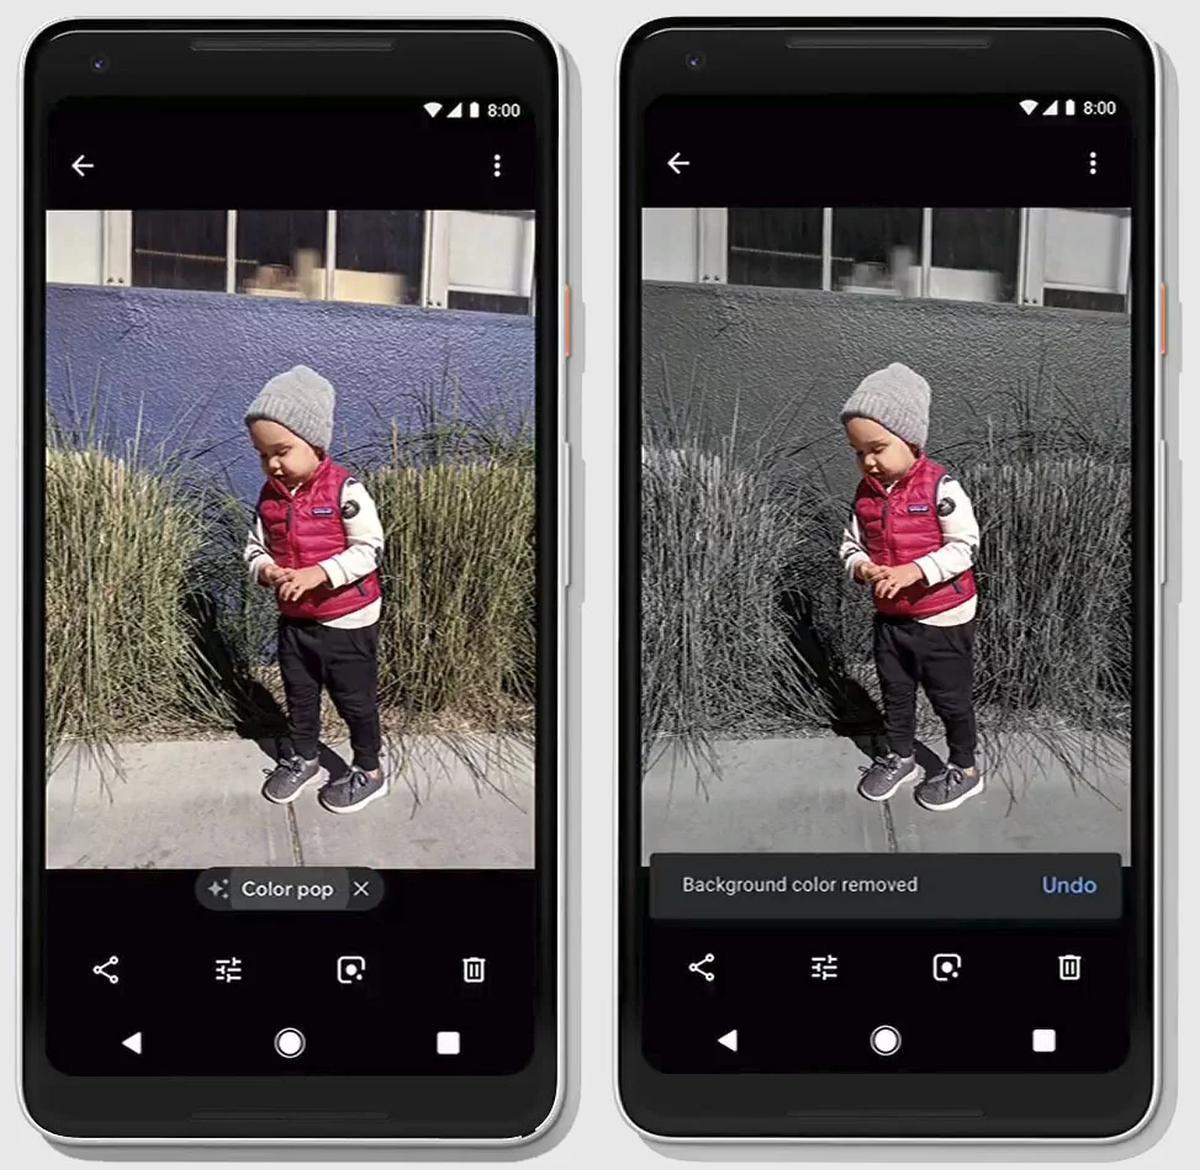 Google Photos Color Pop